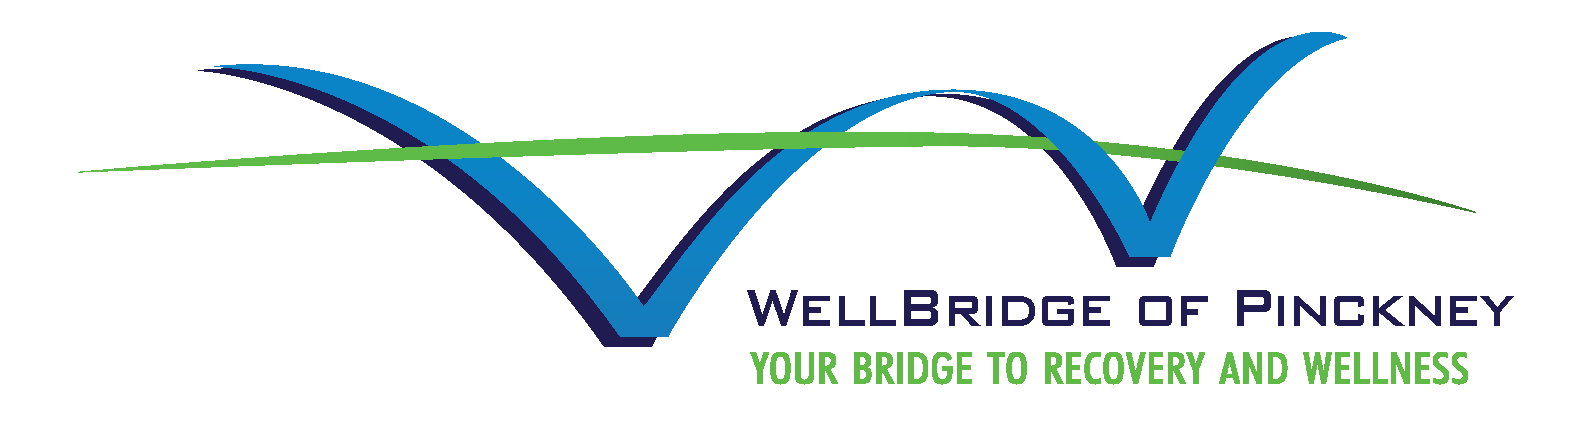 WellBridge_Brighton_PinckneyUSE_FOR_ANNUAL_BUSINESS_SPONSORSHIP_6.14.16.jpg